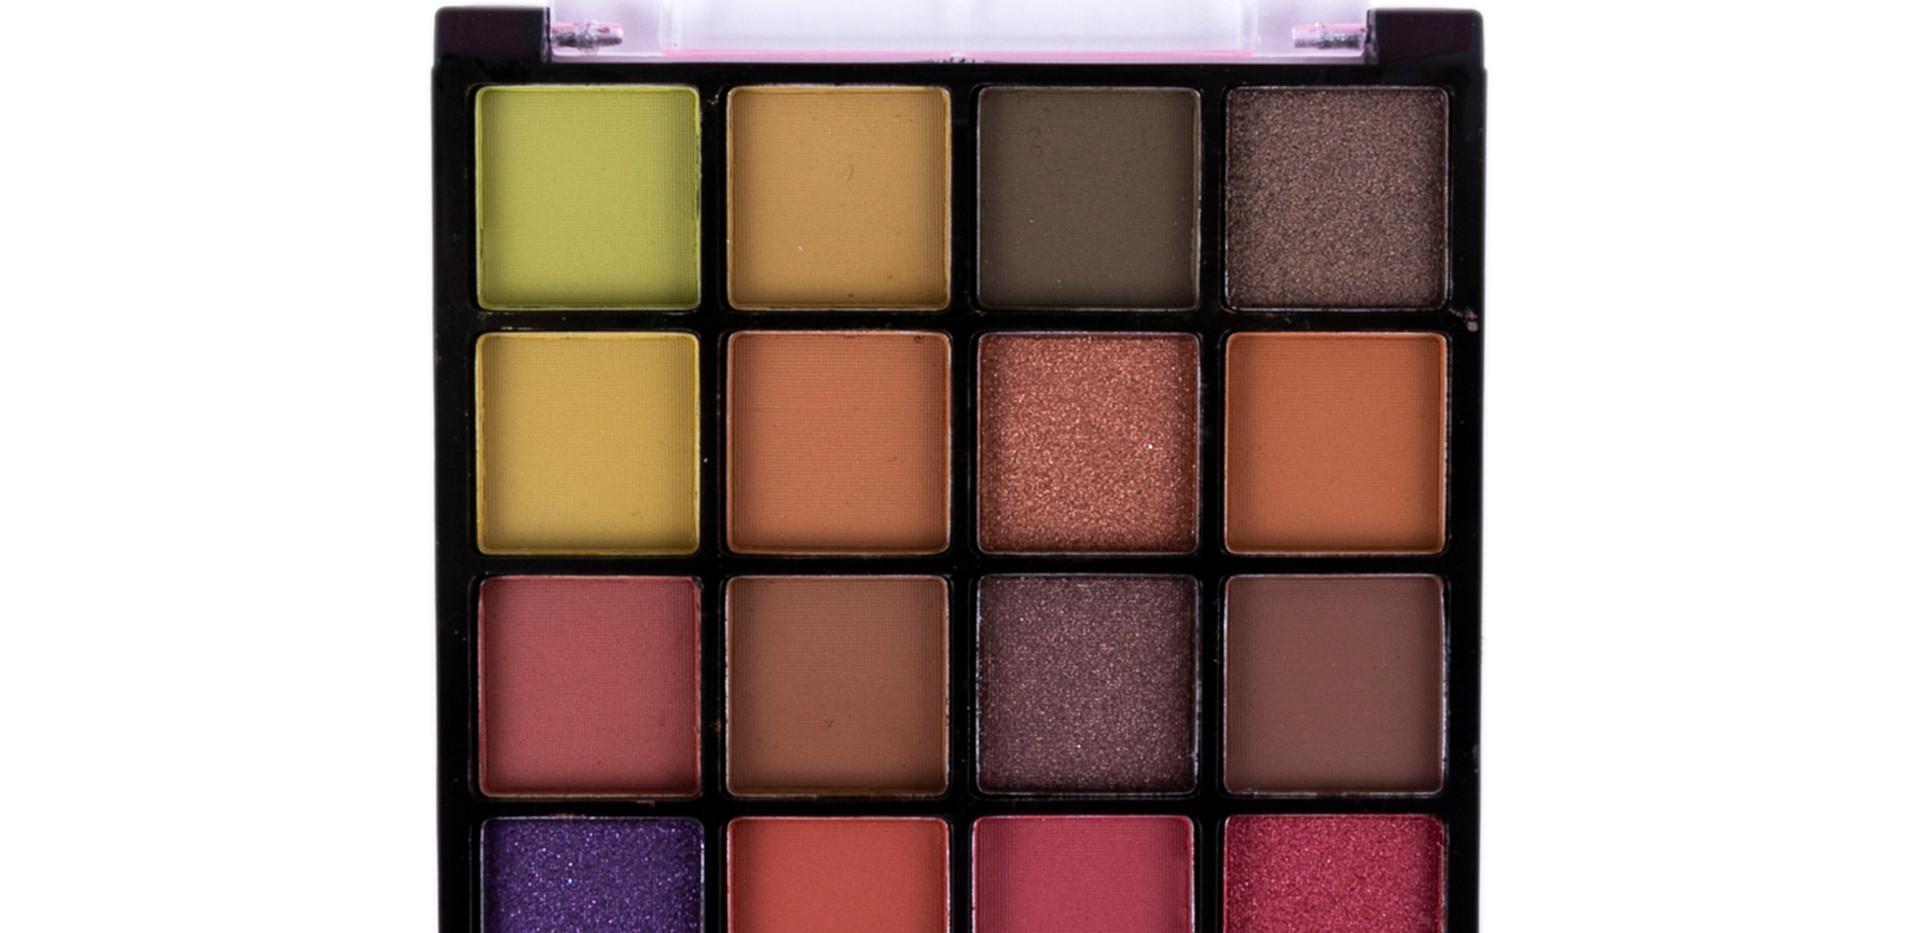 Paleta de Sombras Over the Rainbow Dapop - HB96728 (cor 2)